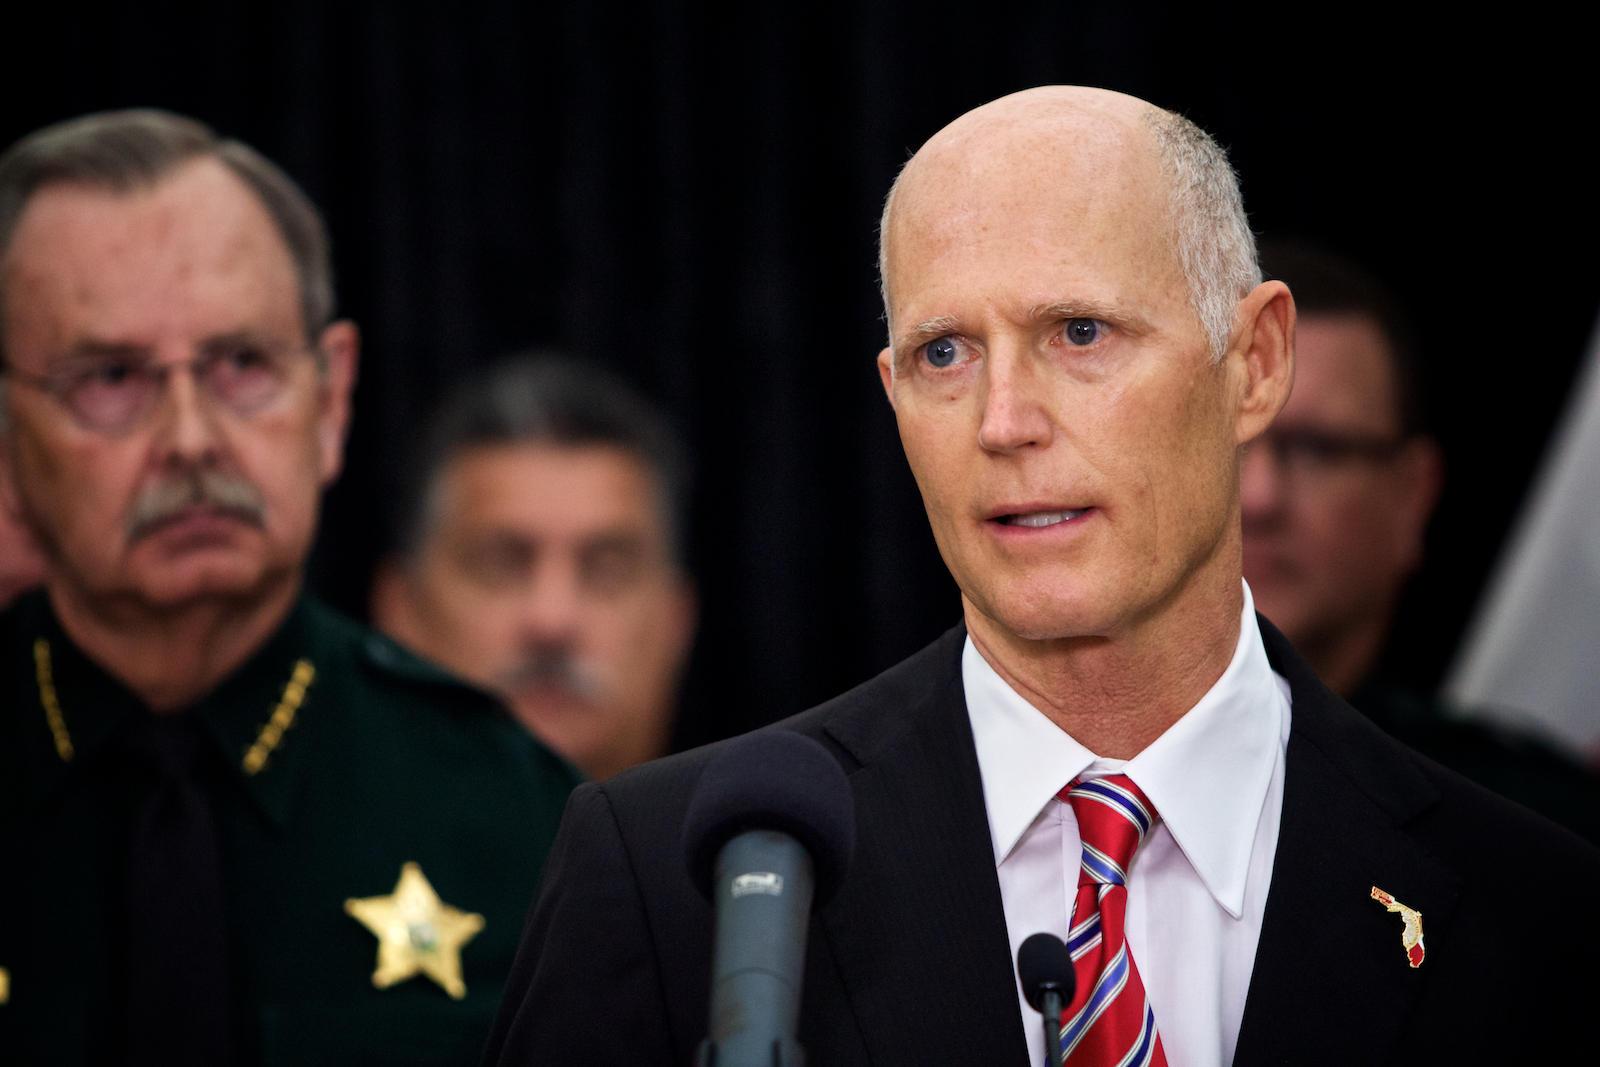 Gov. Scott Pushes $500 Million School Security Plan In Tampa